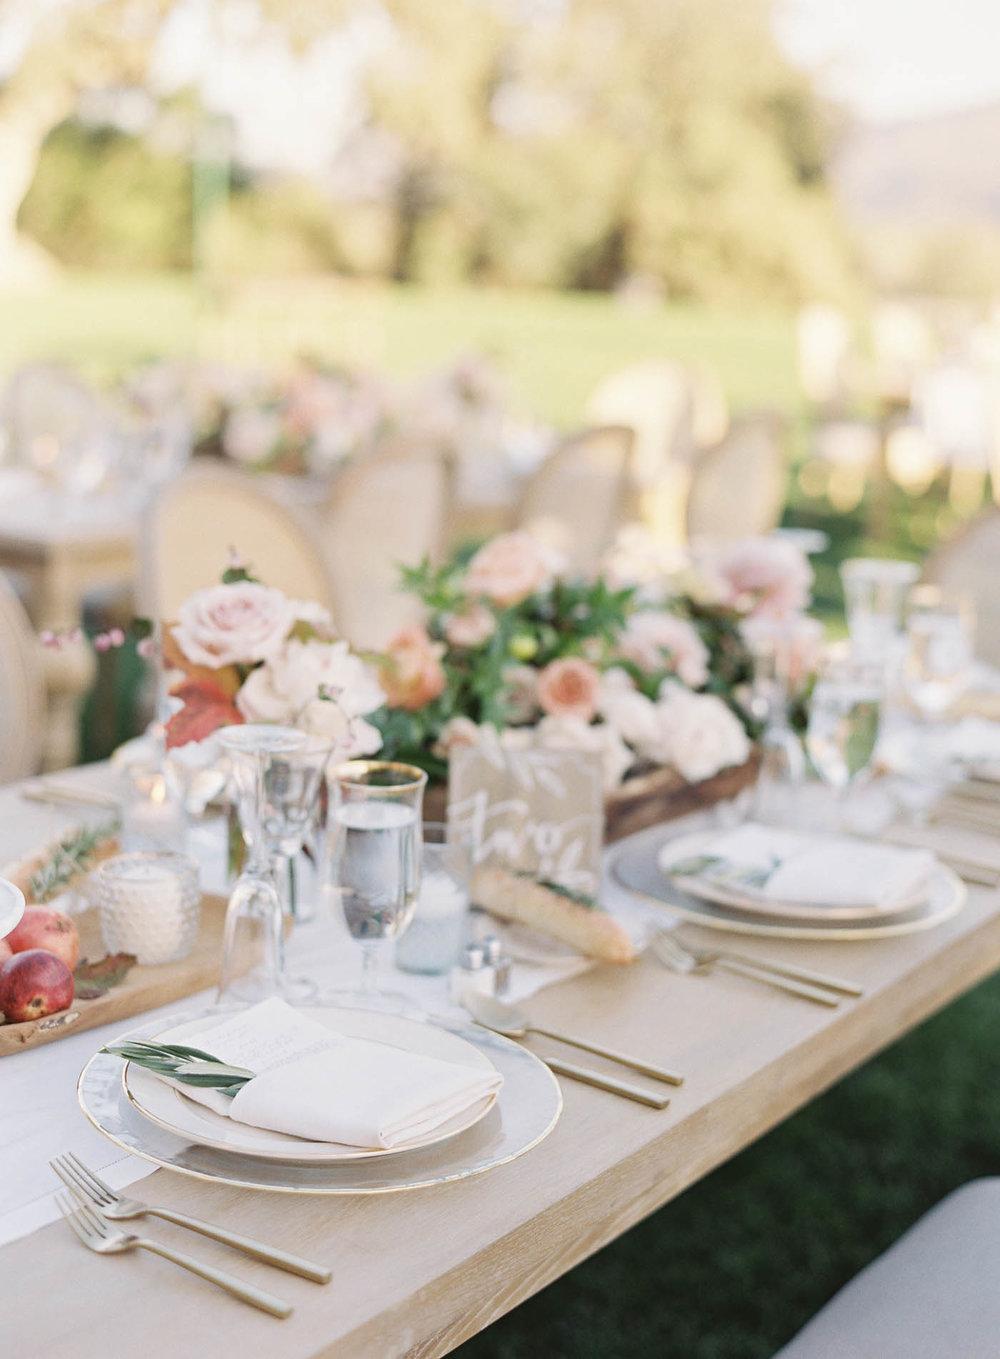 sunstone-villa-wedding-32-Jen_Huang-RD-177-Jen_Huang-009590-R1-012.jpg